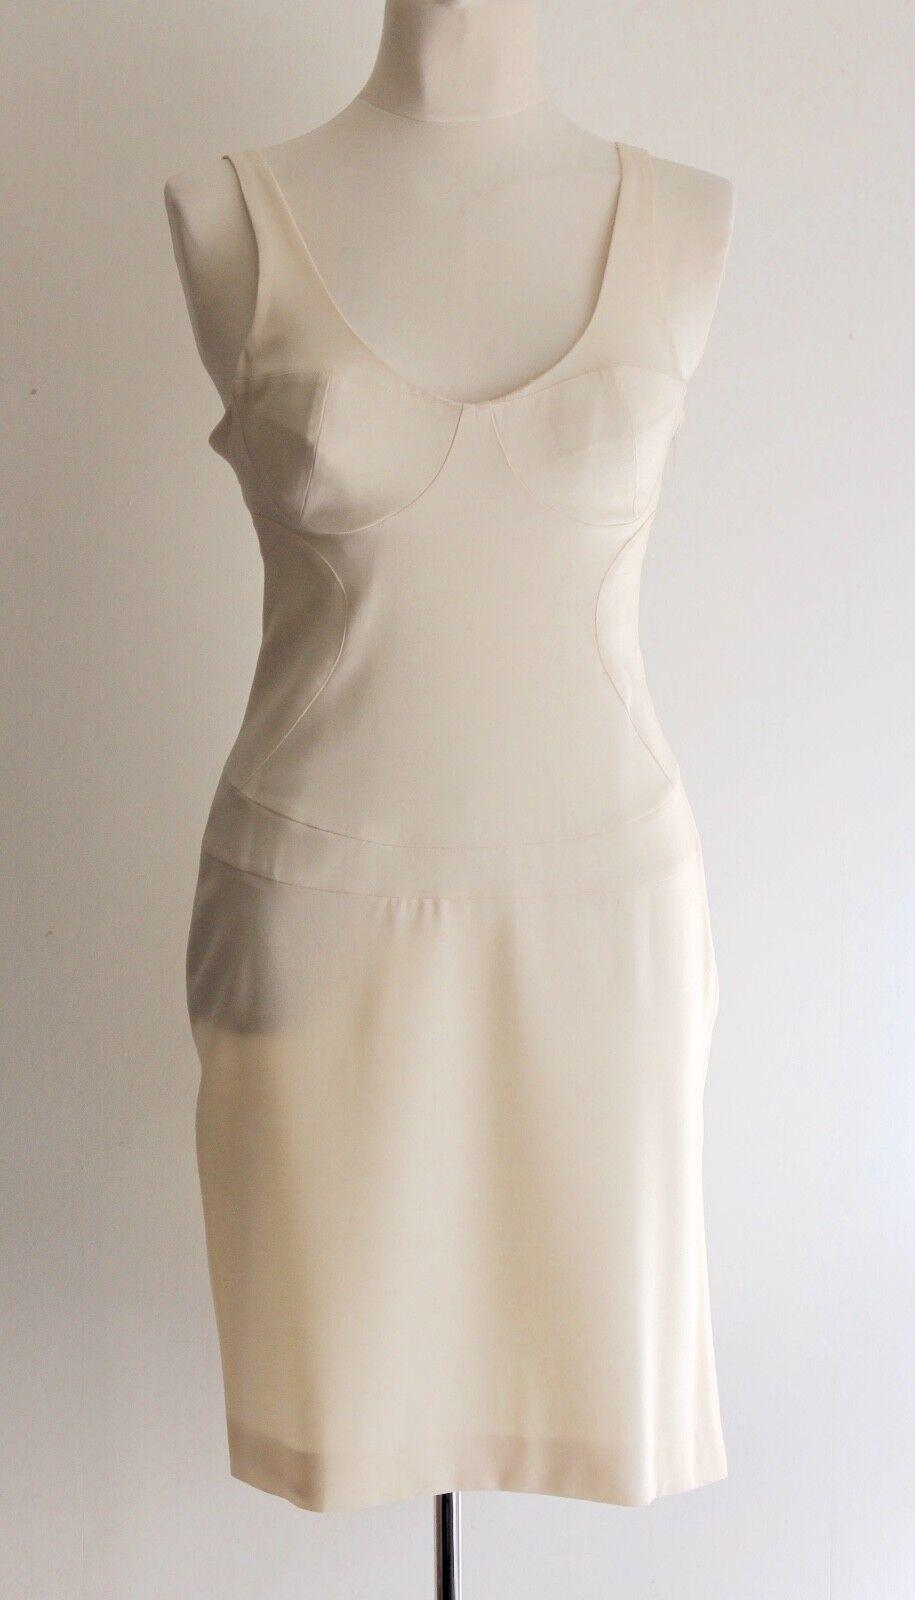 Vintage Gianni Versace Versus Cream Sculpted Dress Sized IT 42 Fit  10